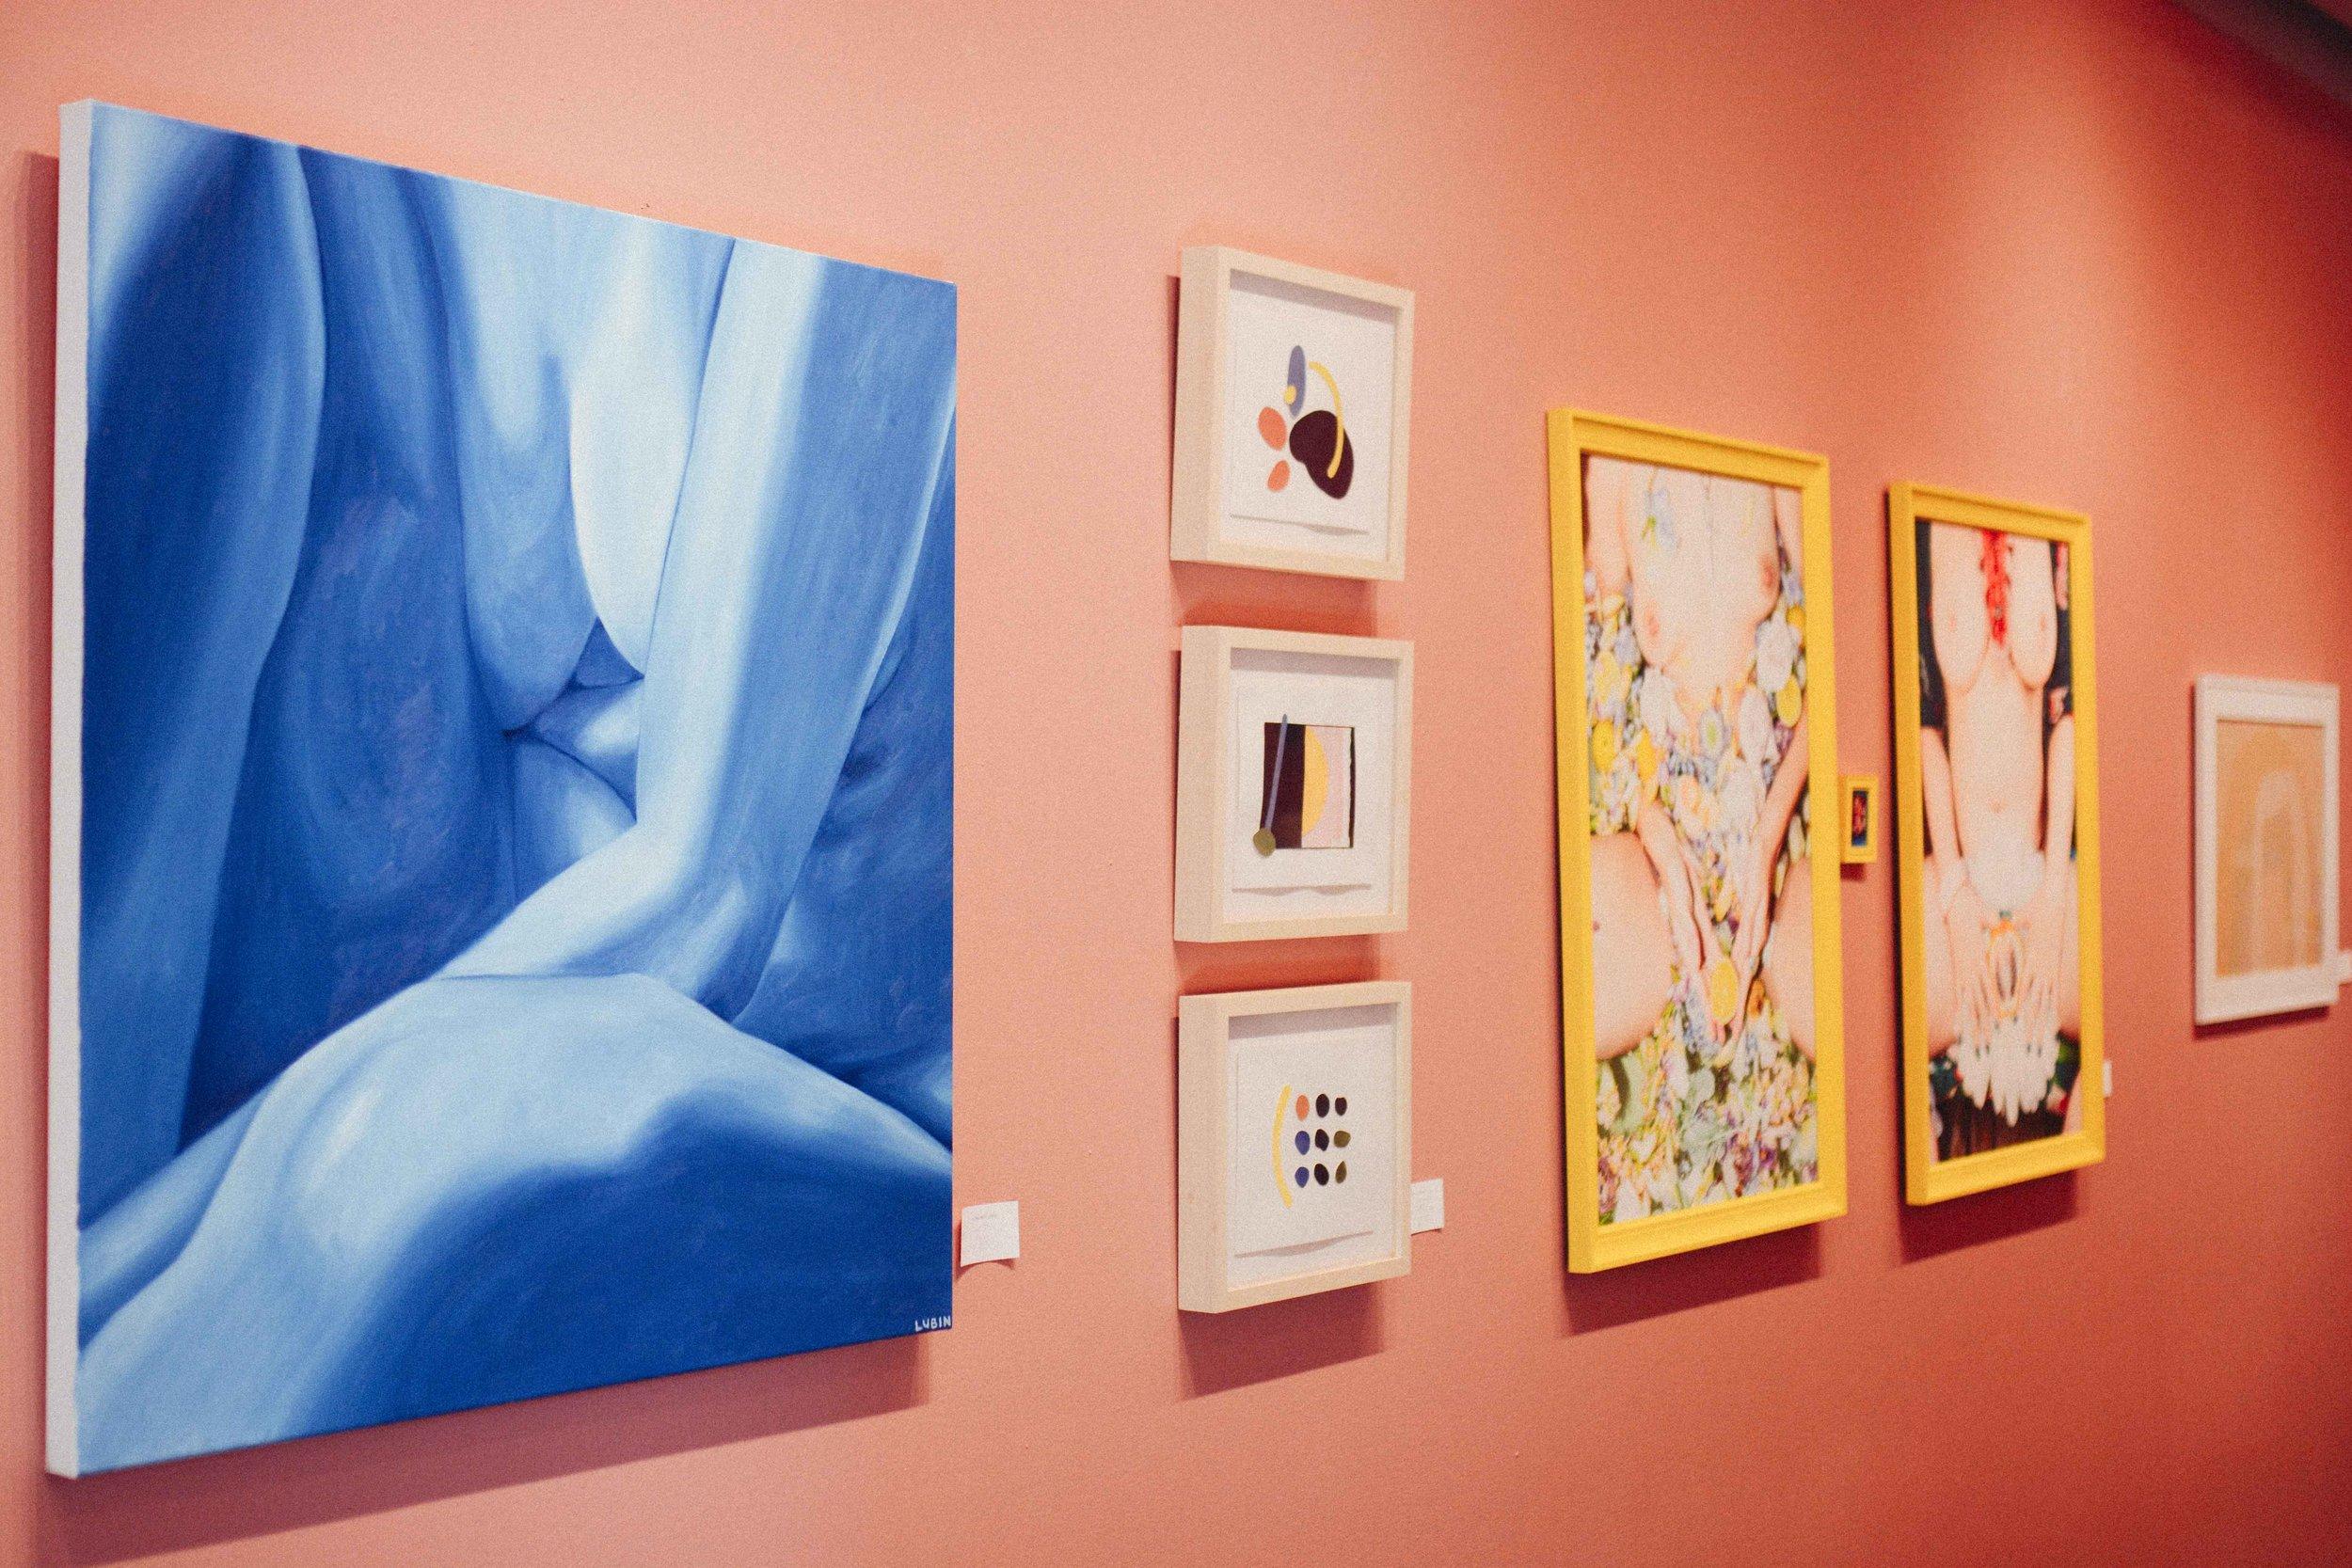 Primavera_Content_Exhibition Shots_Main Wall 2.jpg